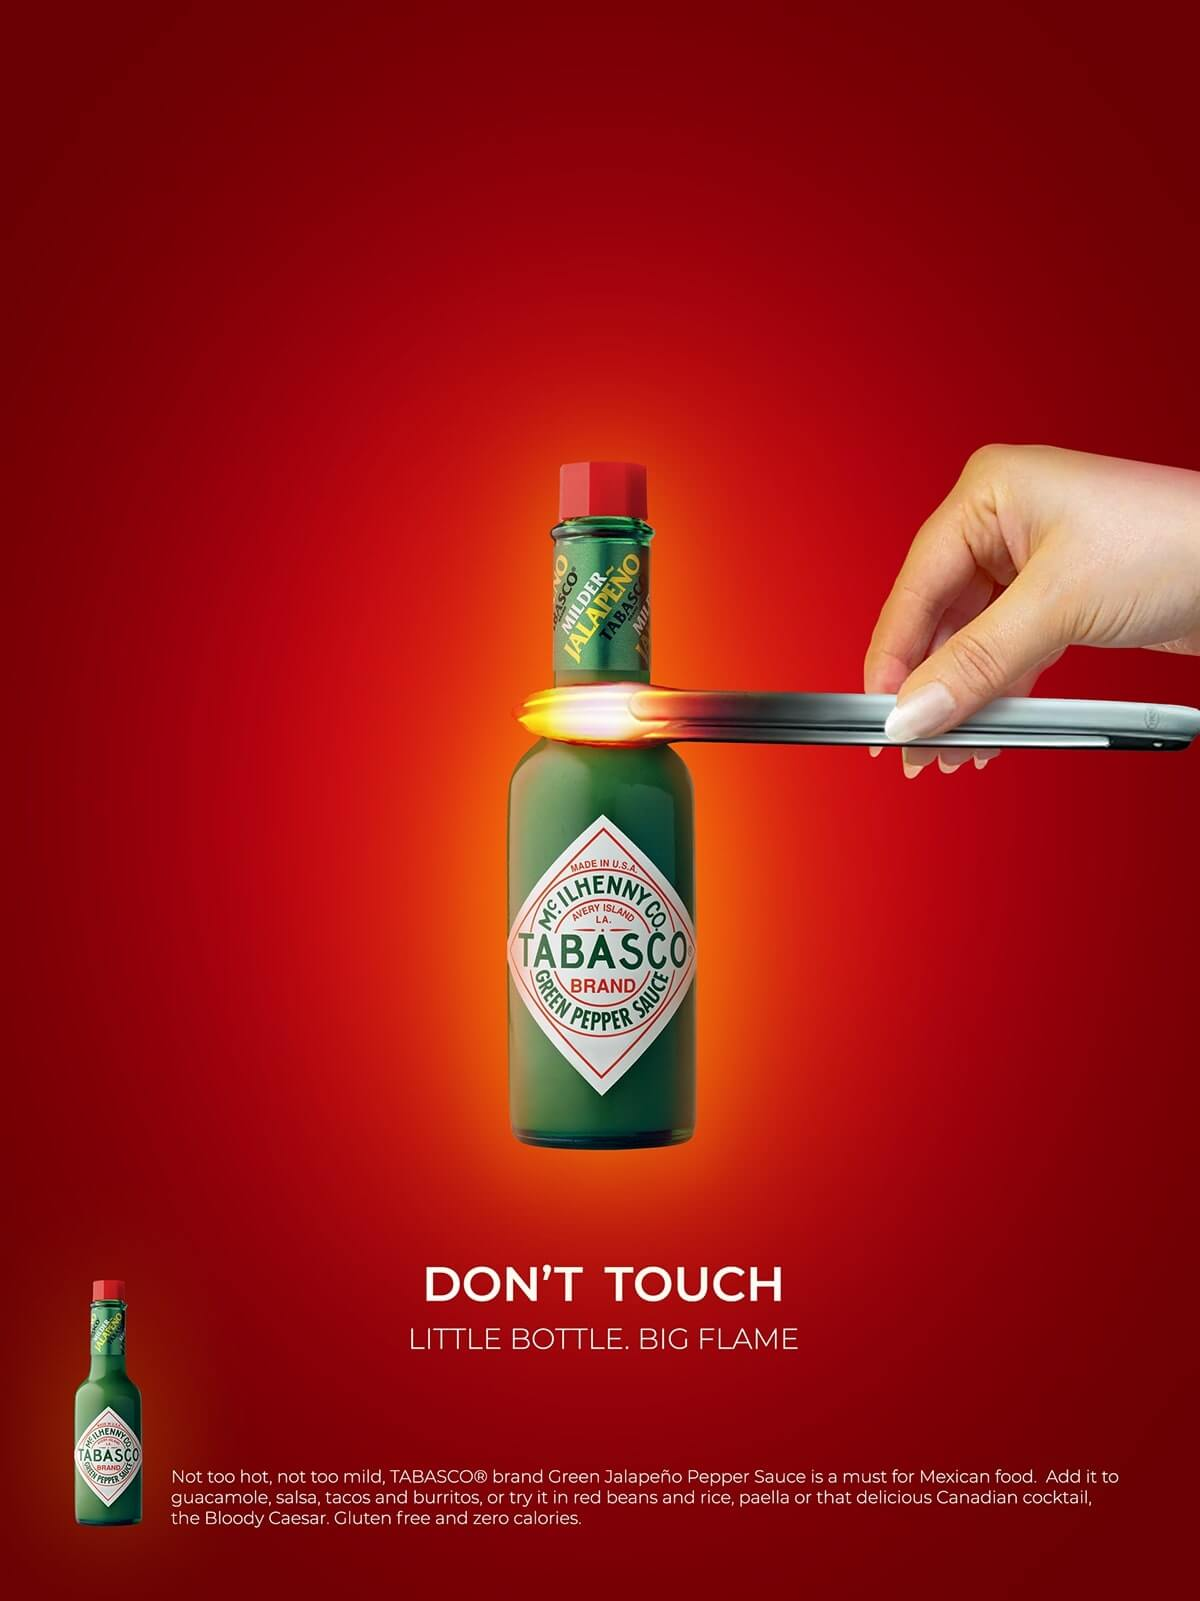 Print Advertisement for Tabasco